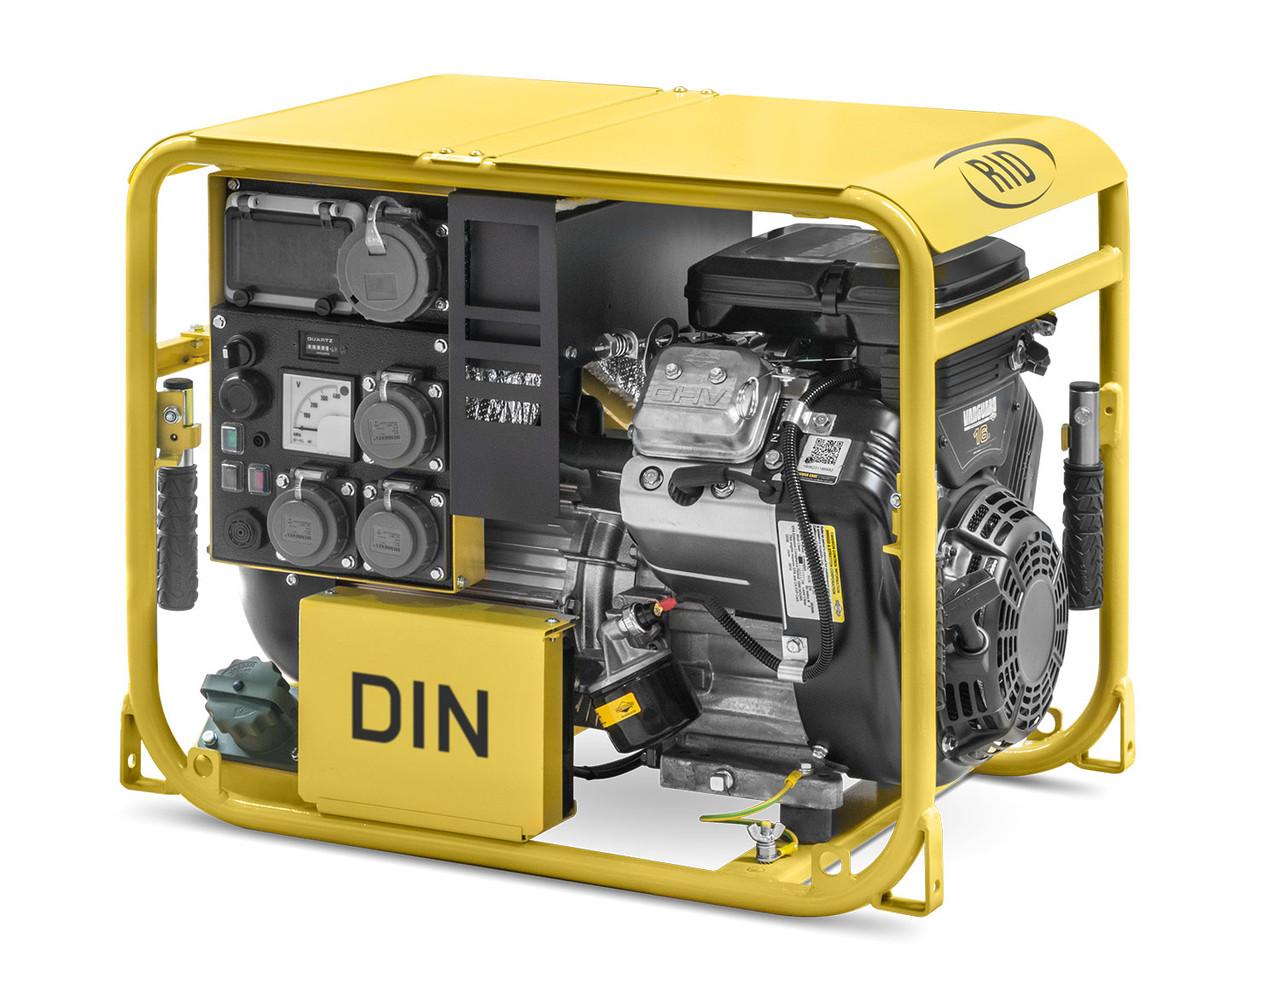 DIN RID RV 9540 ERN (6,8 кВт)